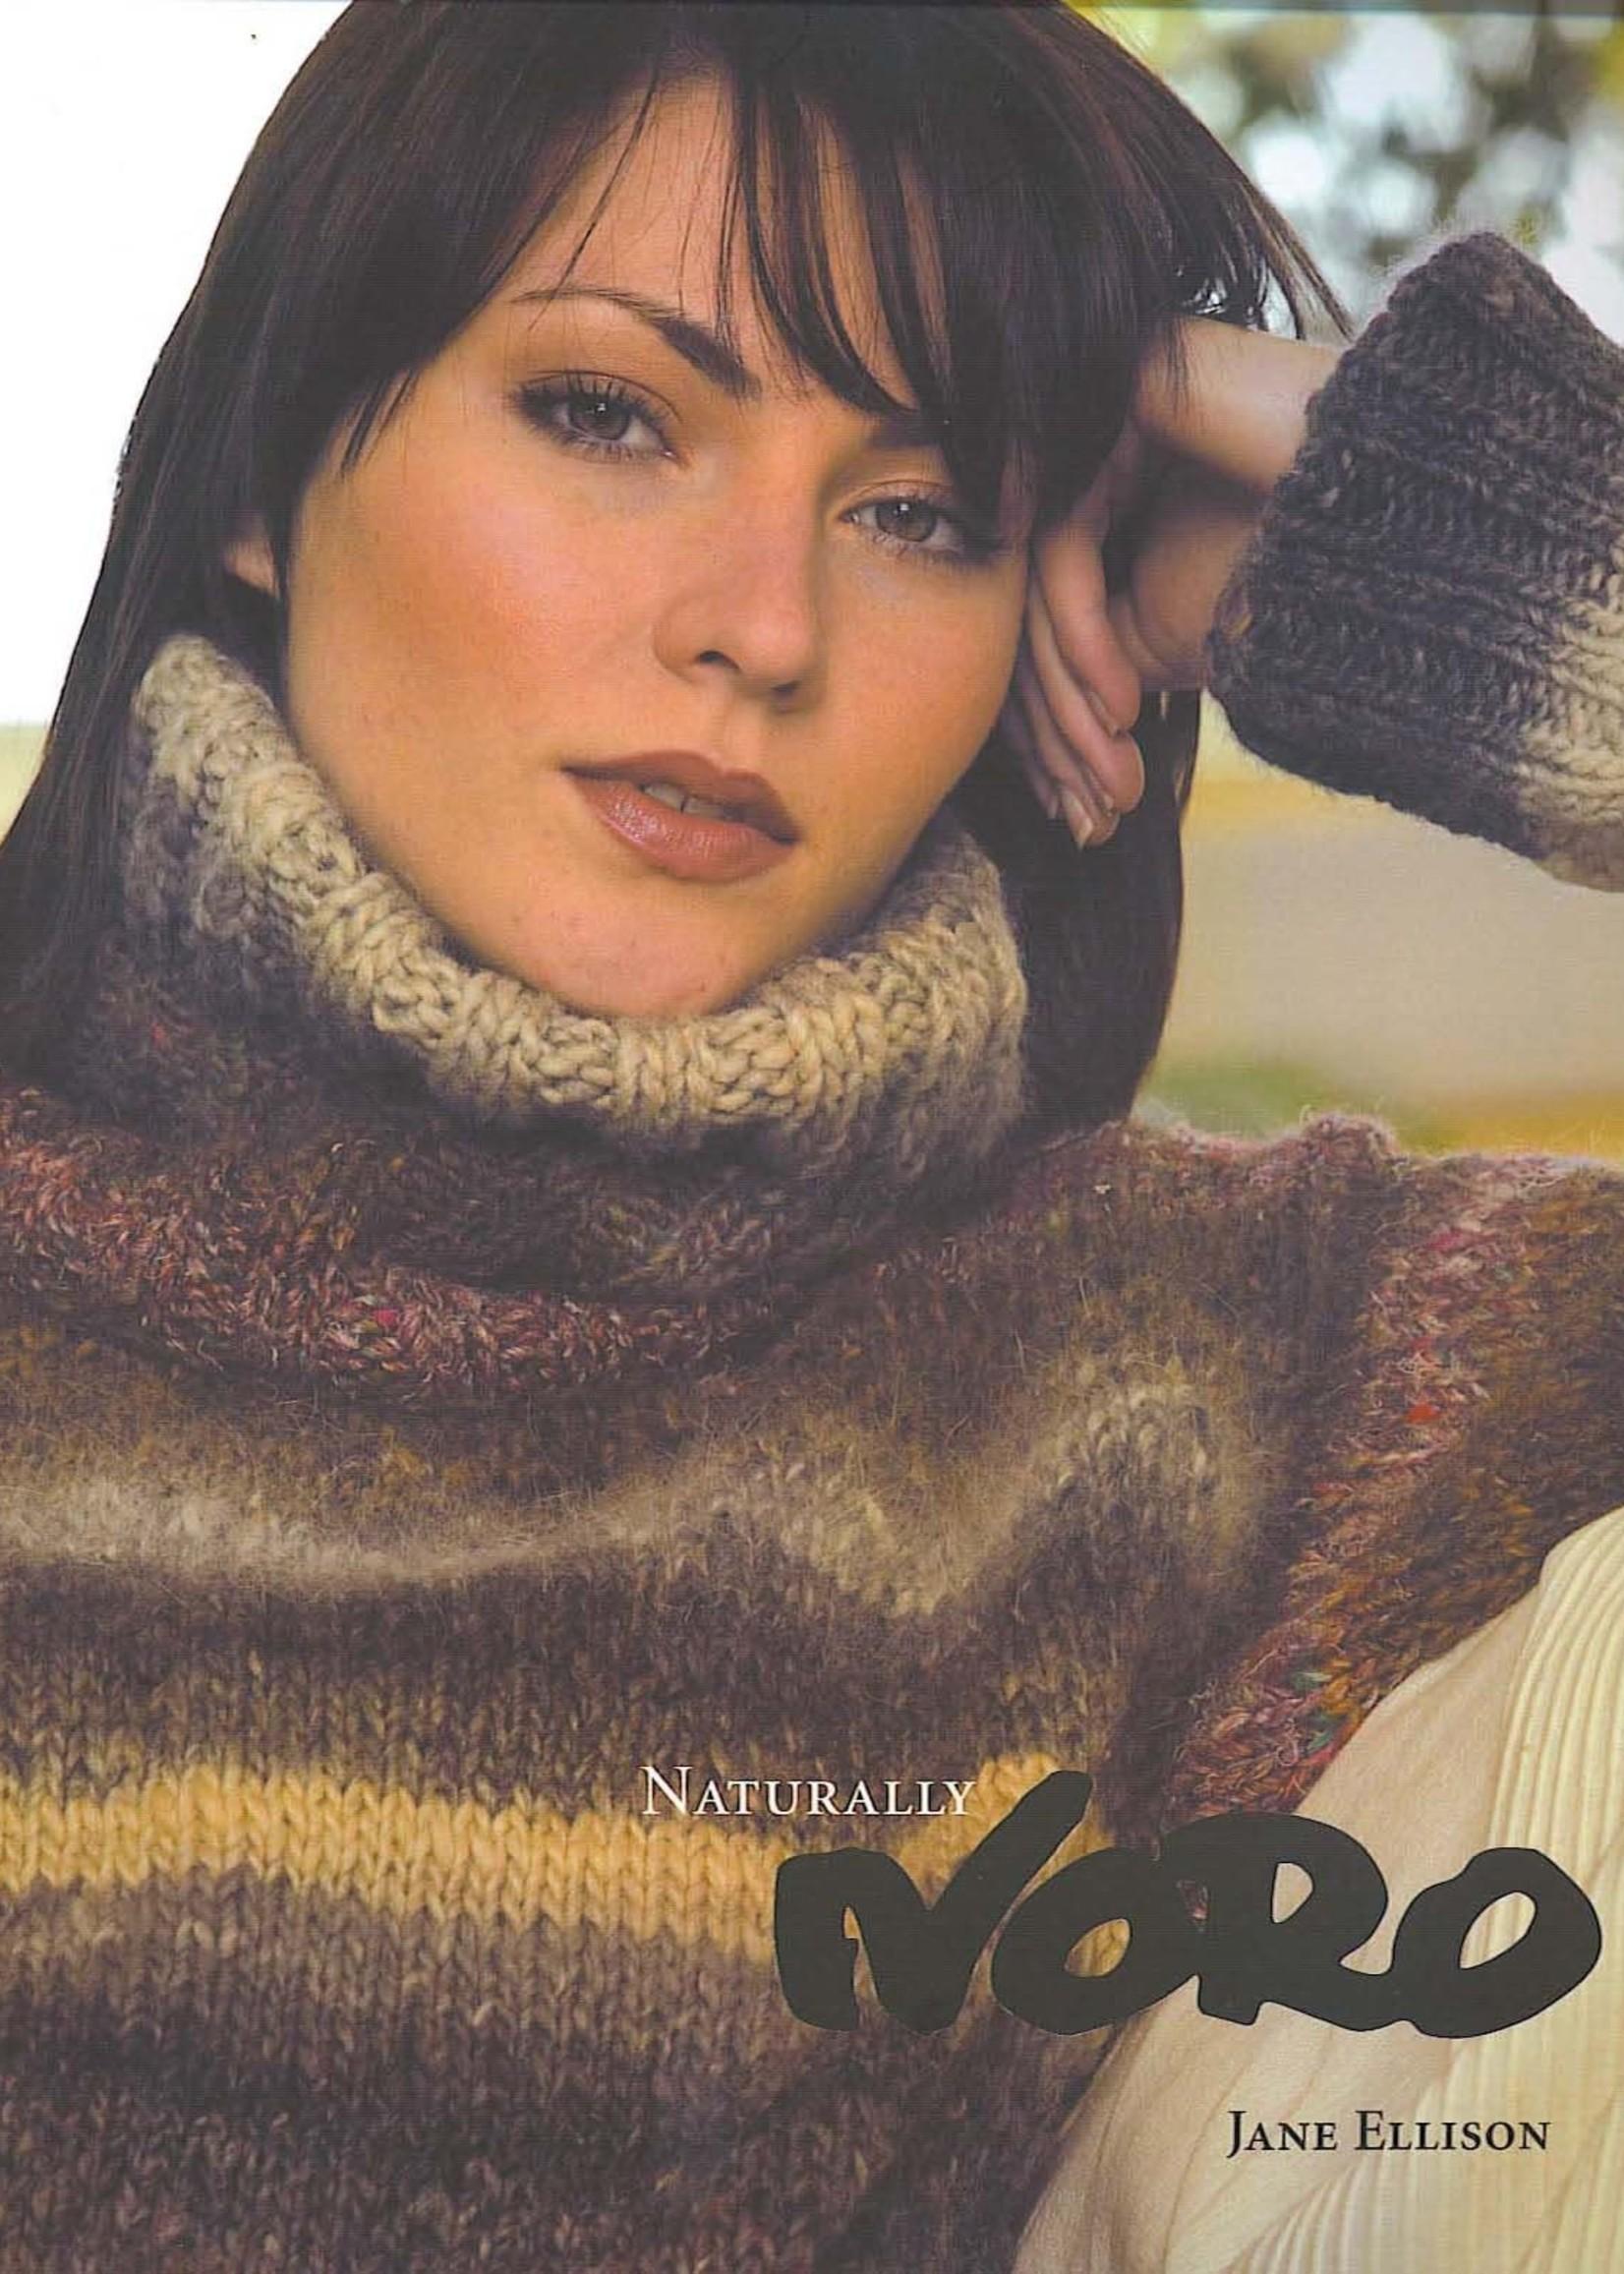 Noro Pattern Books Naturally by Jane Ellison